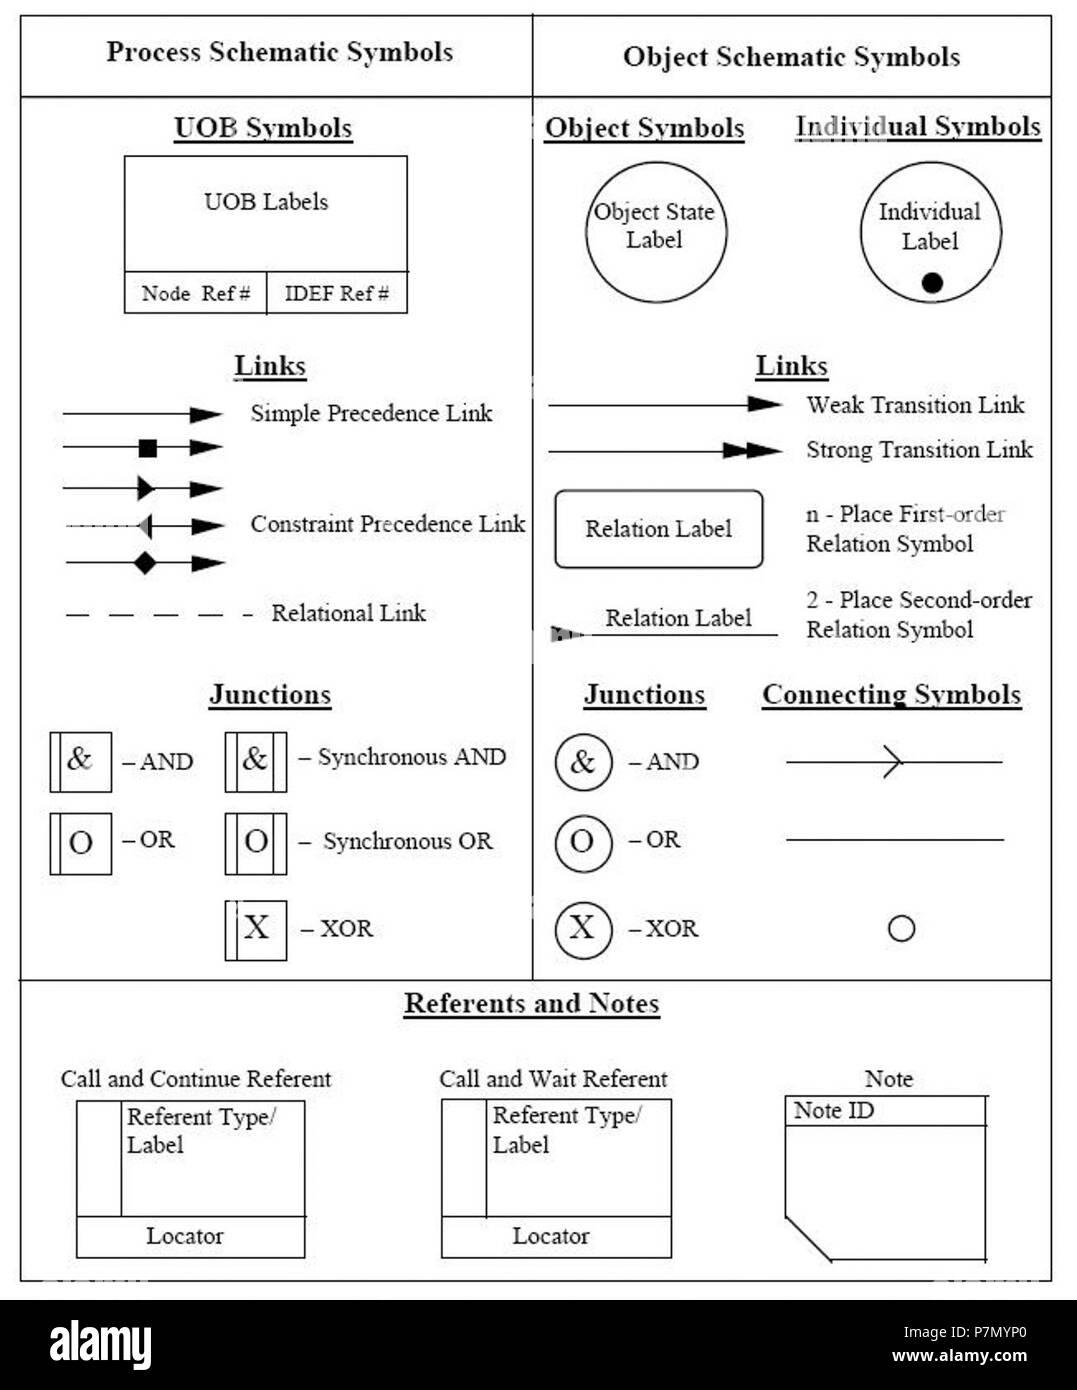 3-01a Symbols Used for IDEF3 Process Description Schematics. - Stock Image